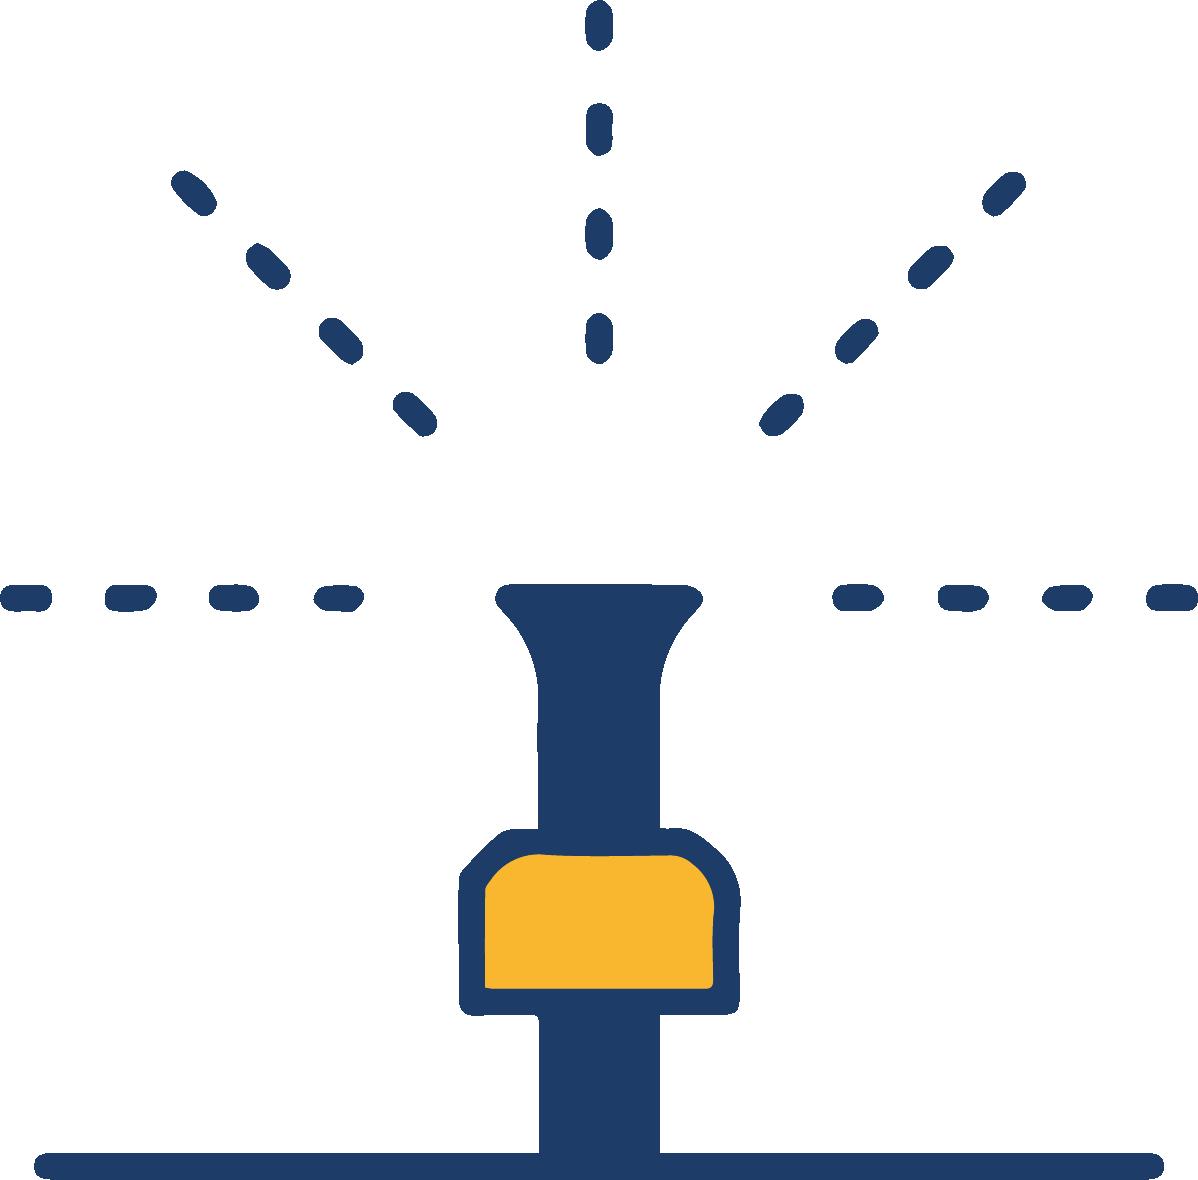 Sistemas de riego icono